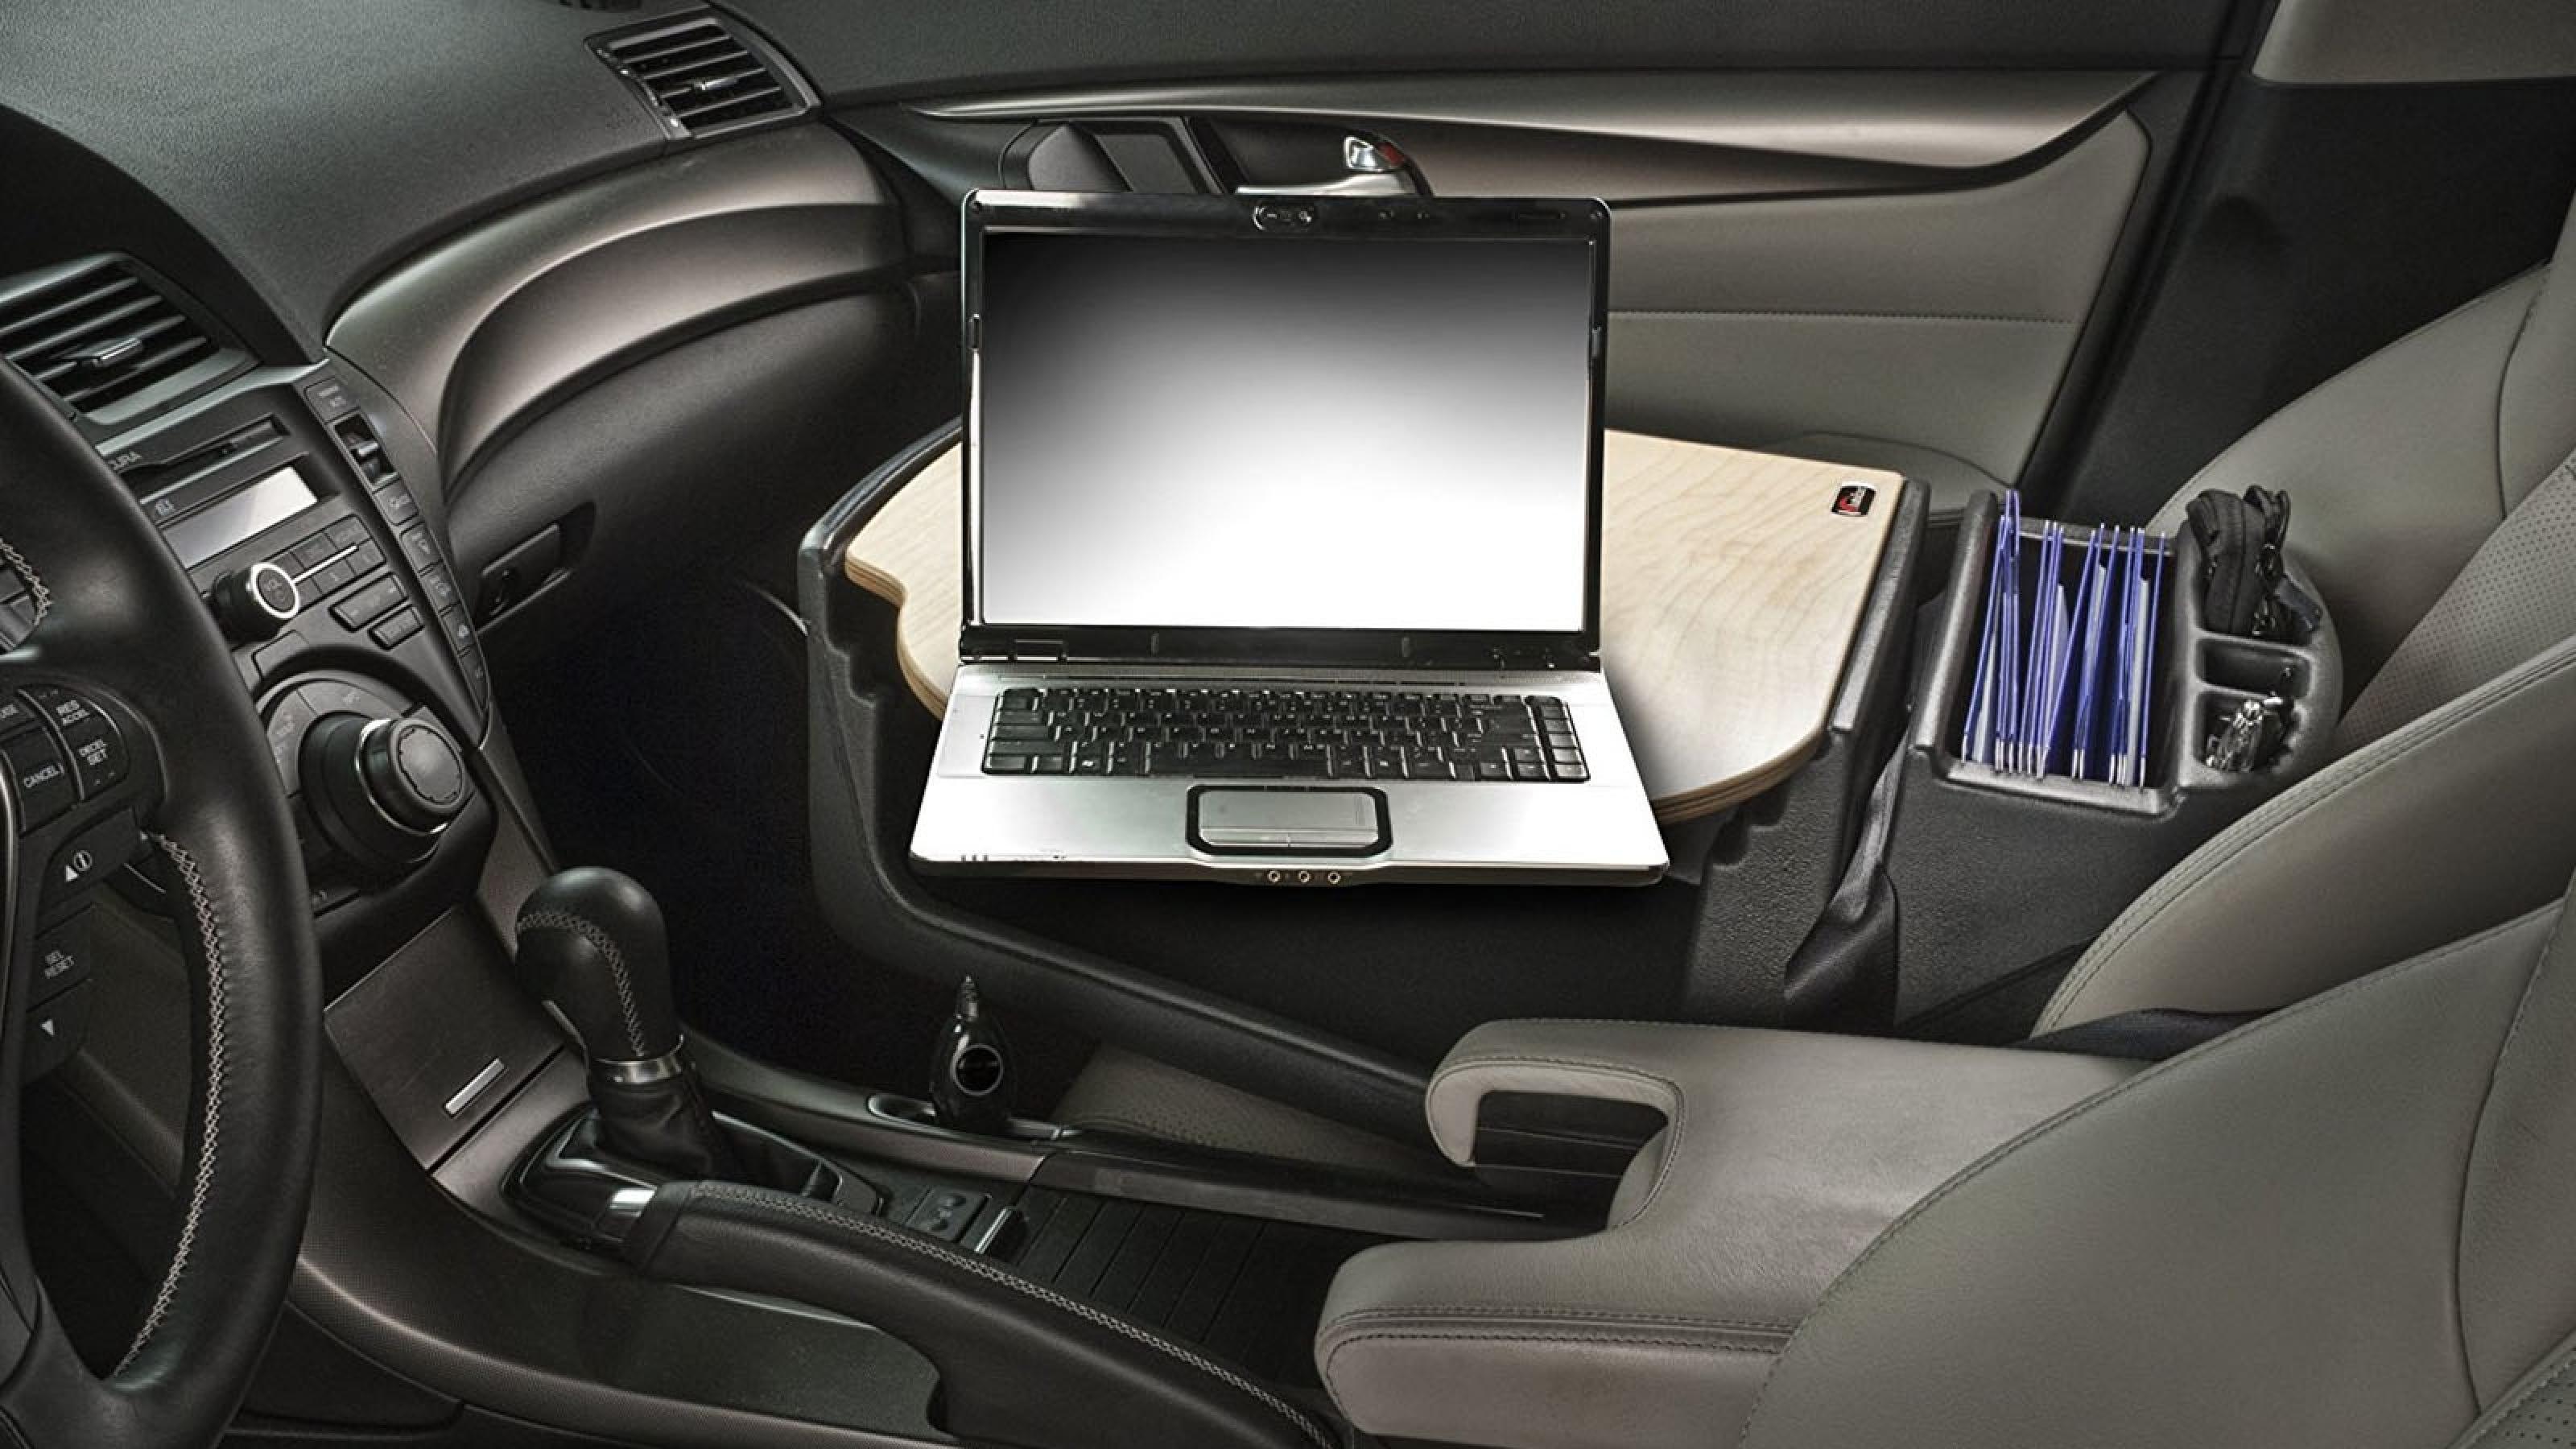 Car Steering Wheel Tray Table Laptop Stand Work Desk Drink Holder Clip Mount